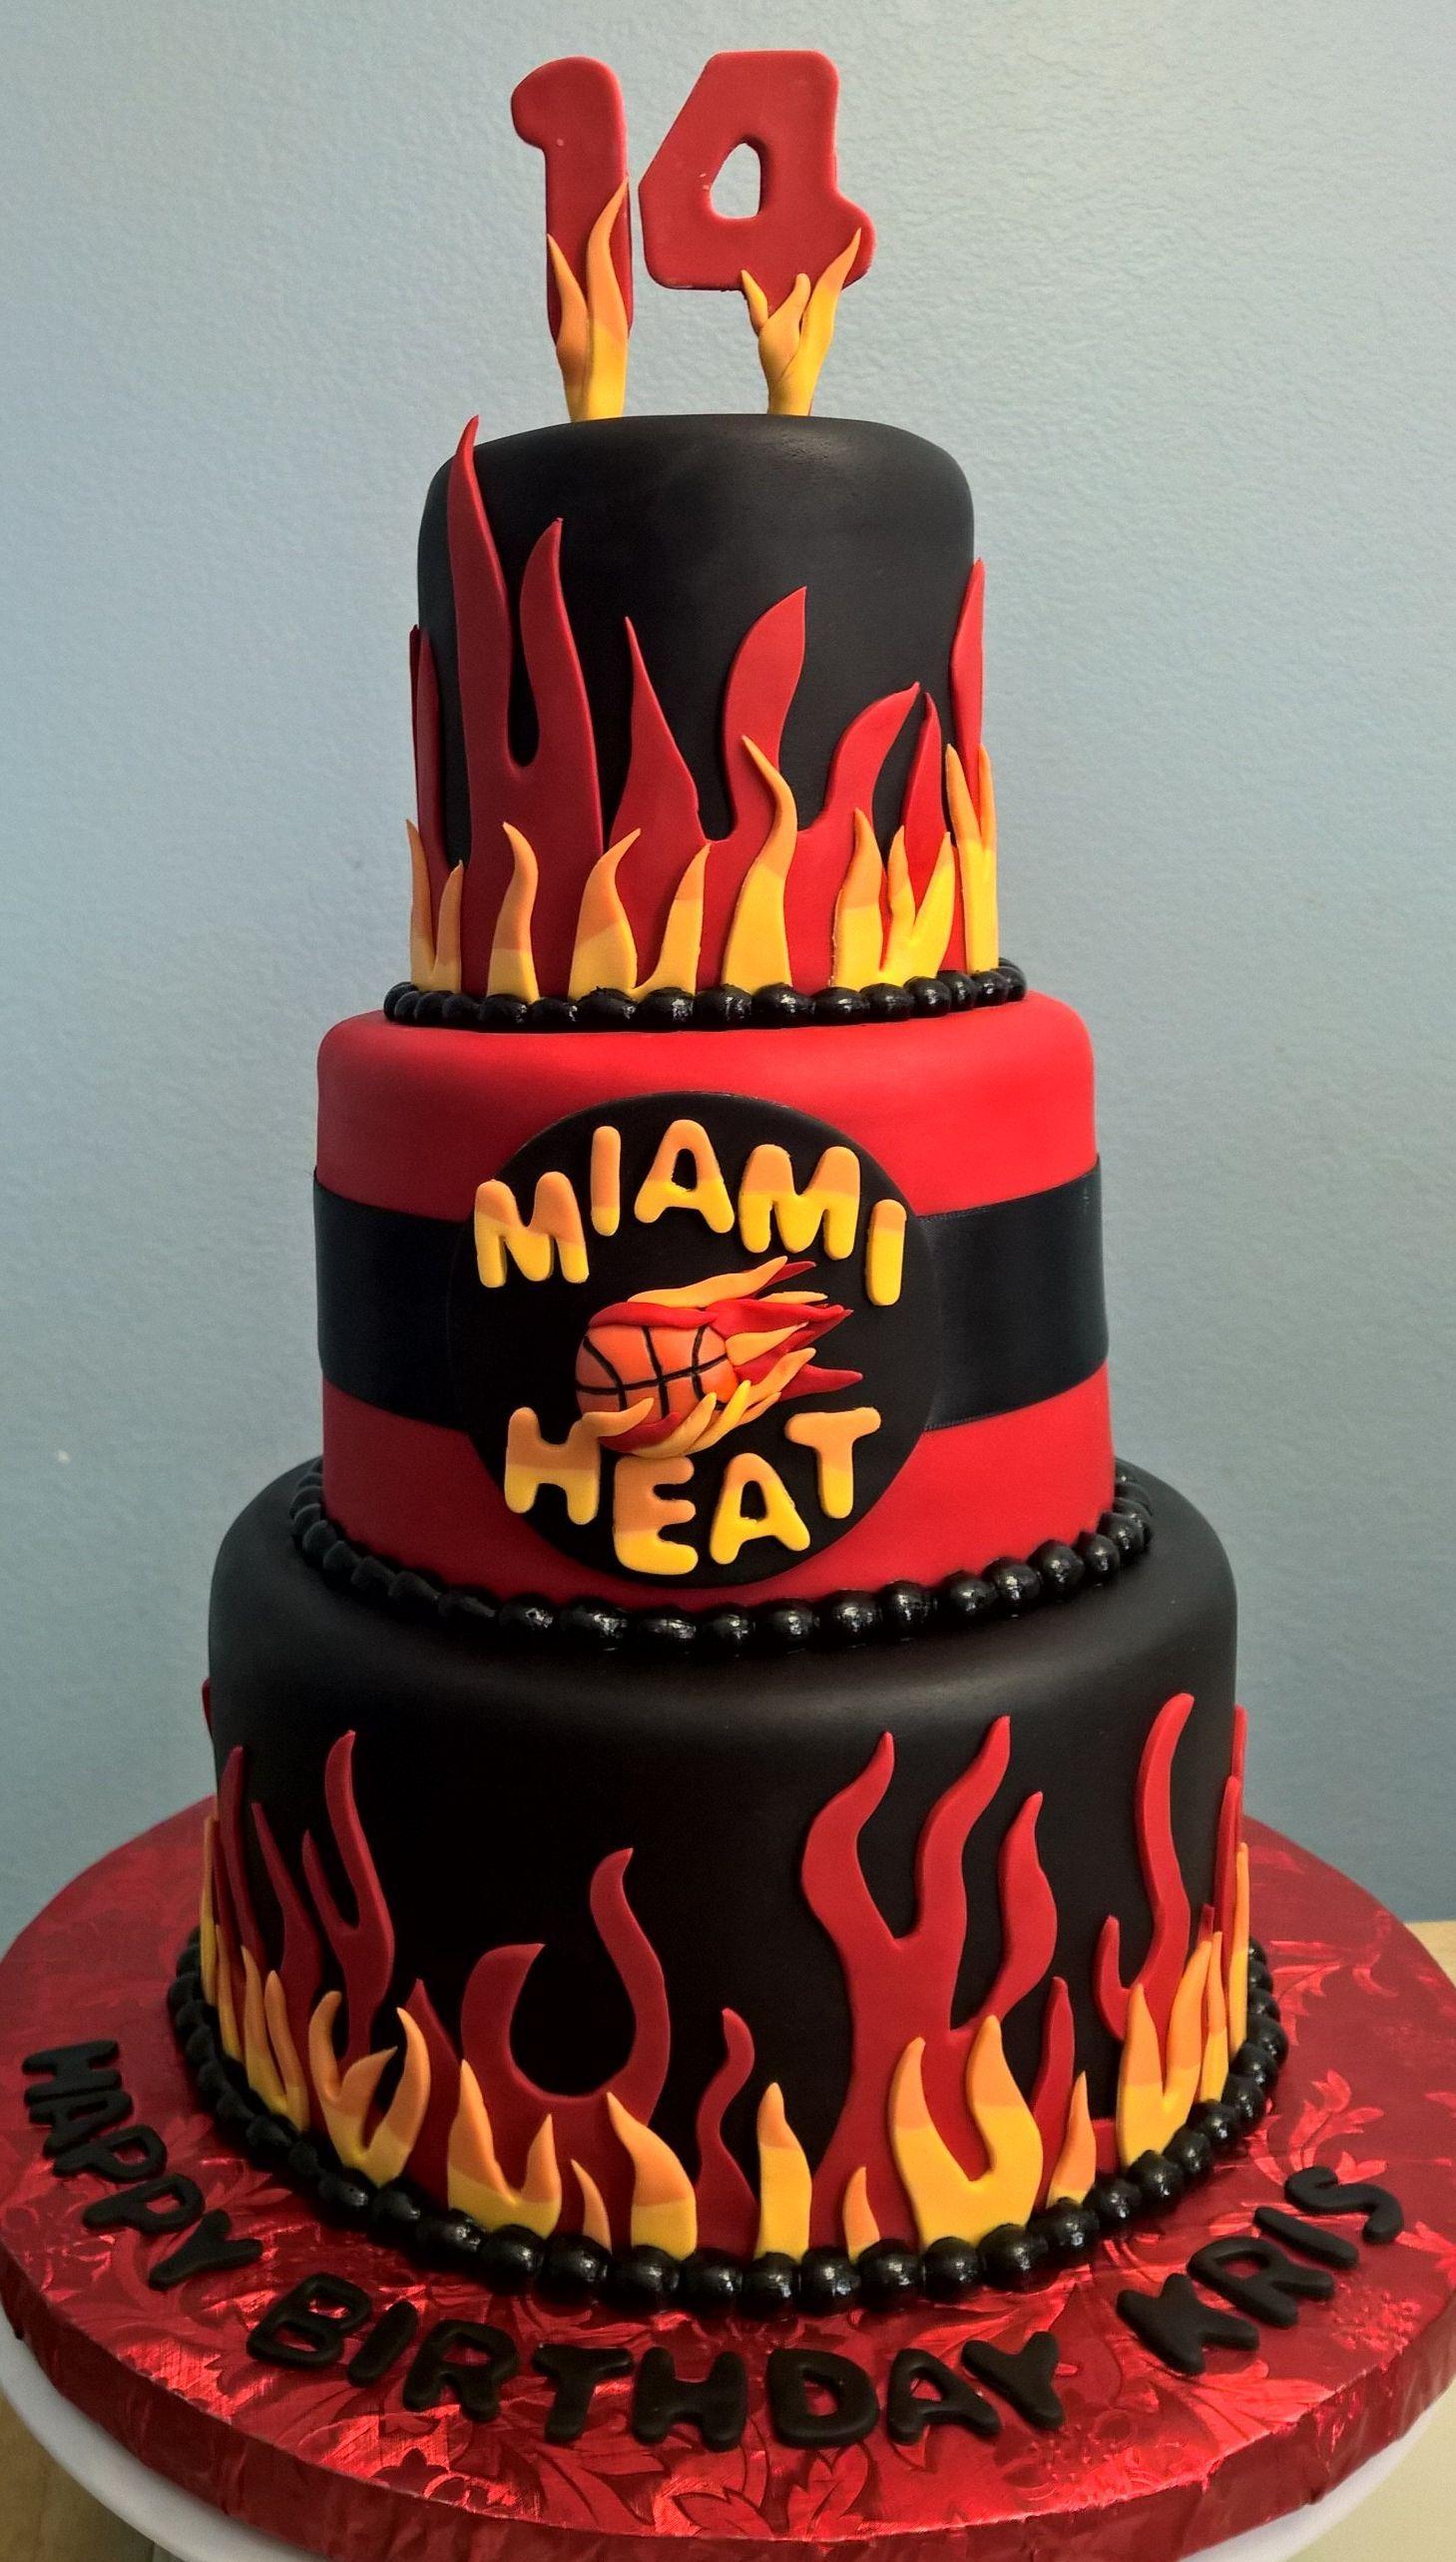 Soccer Miami Birthdays Miami Heat Cake Birthdays Miami Heat Tshirt Miami Heat Vice City Wallpaper Miami Heat Game Outfit In 2020 Miami Heat Cake Miami Heat Cake